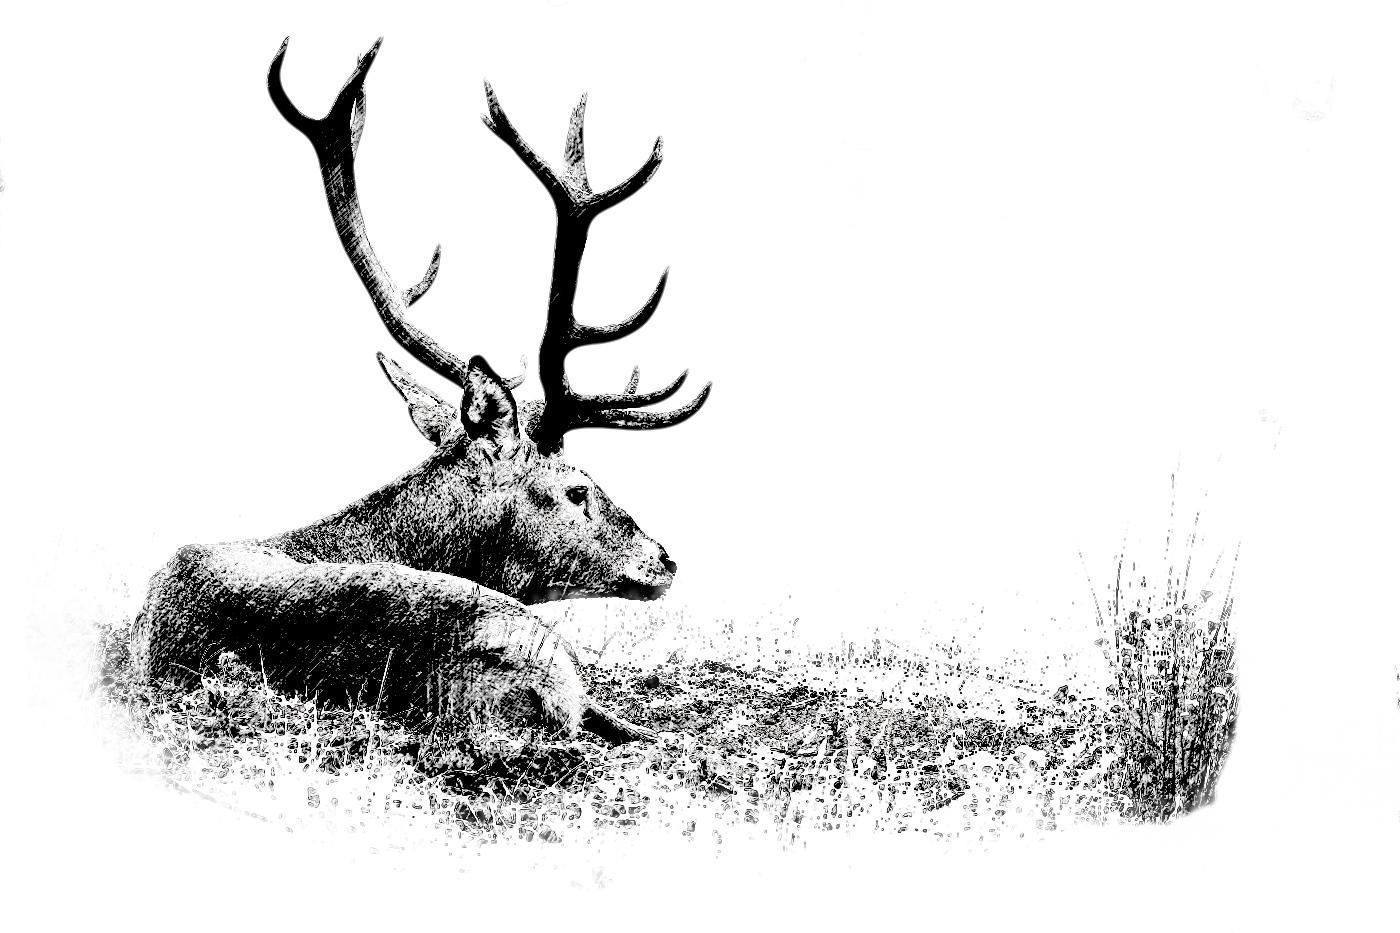 Coto de caza mayor España. Dibujo de ciervo iberico tumbado